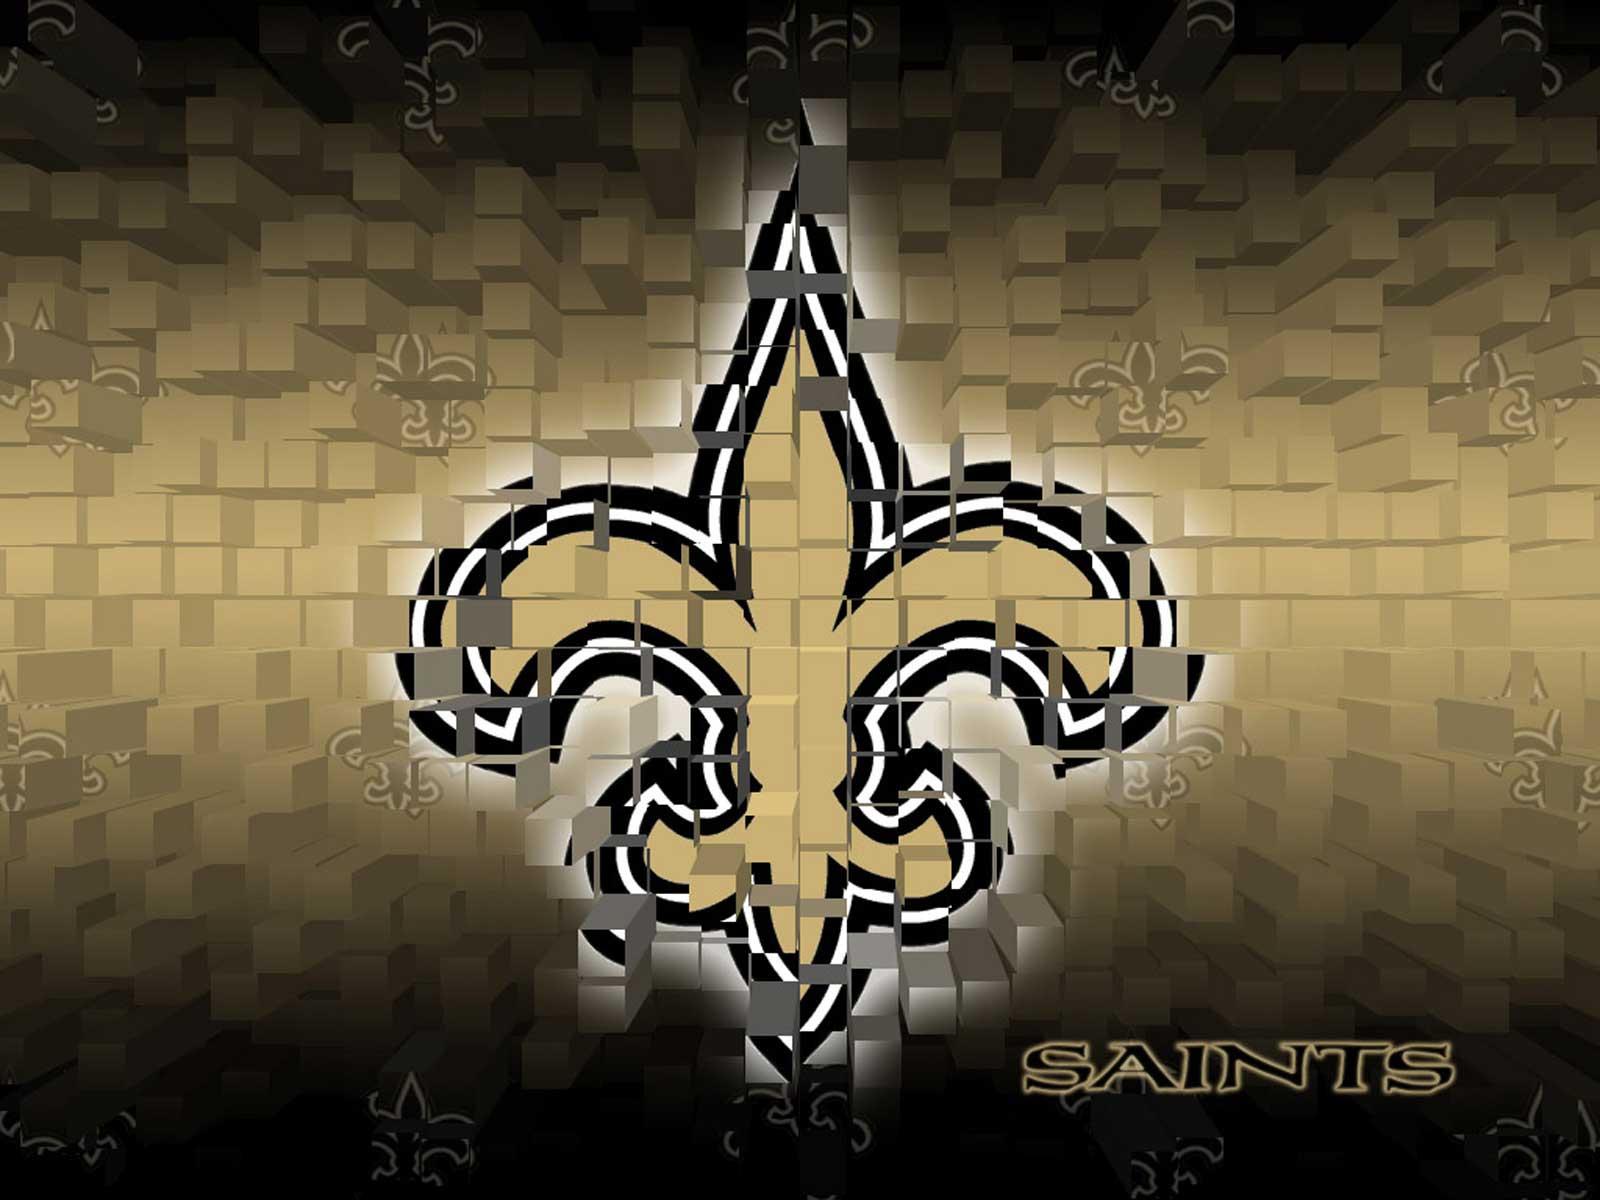 Saints Wallpaper